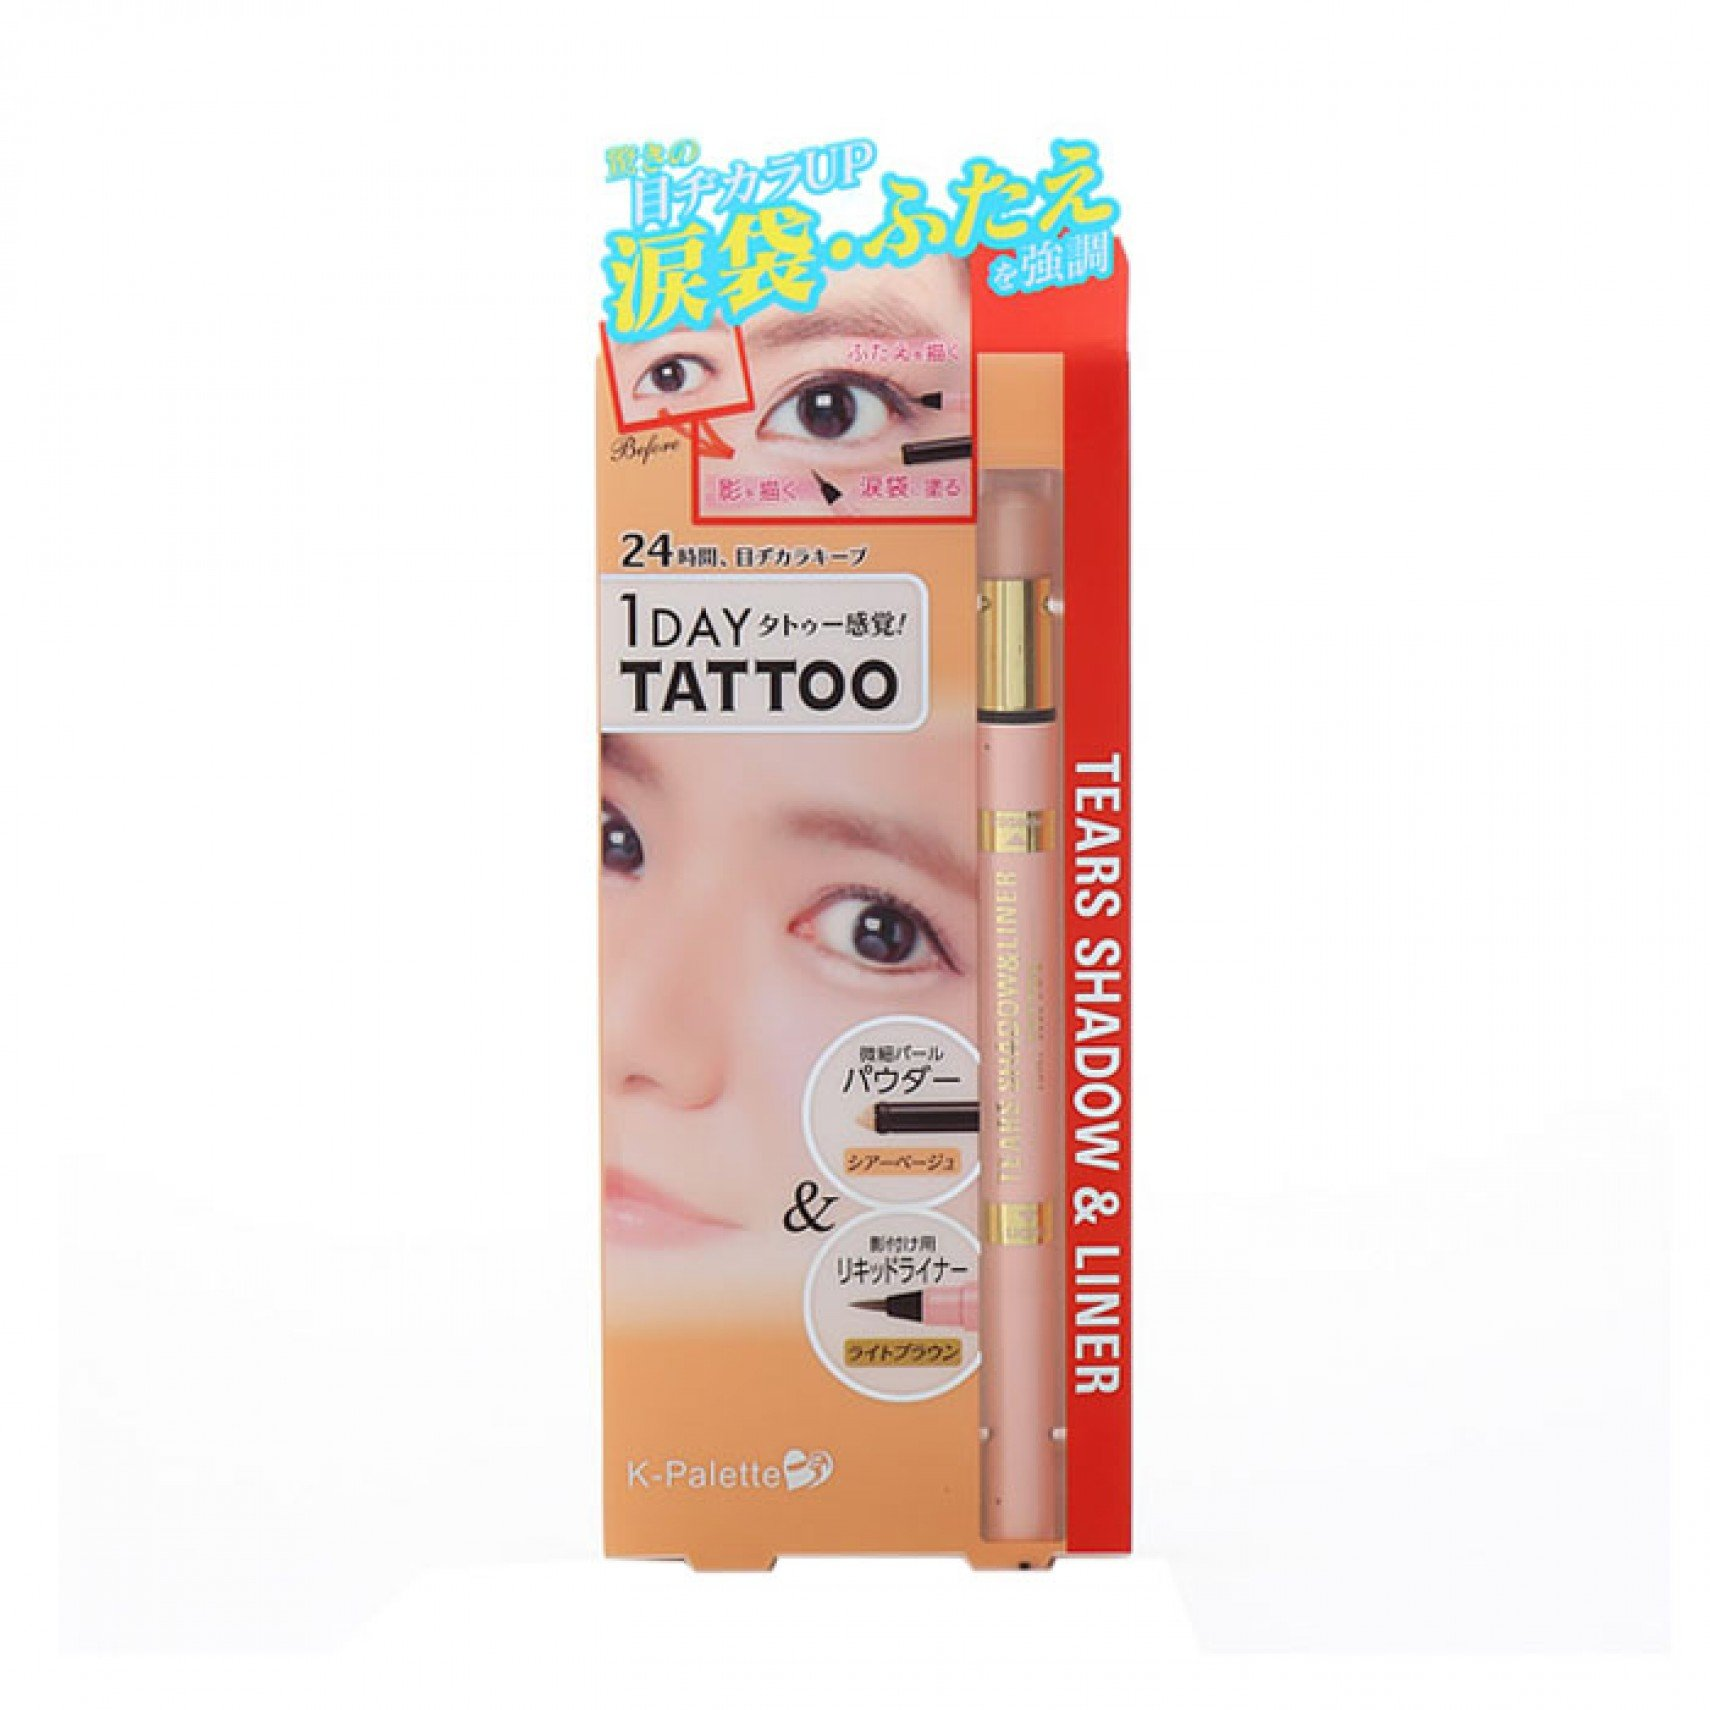 K Palette Tears Shadow and Liner 02 Sheer Beige/Light Brown